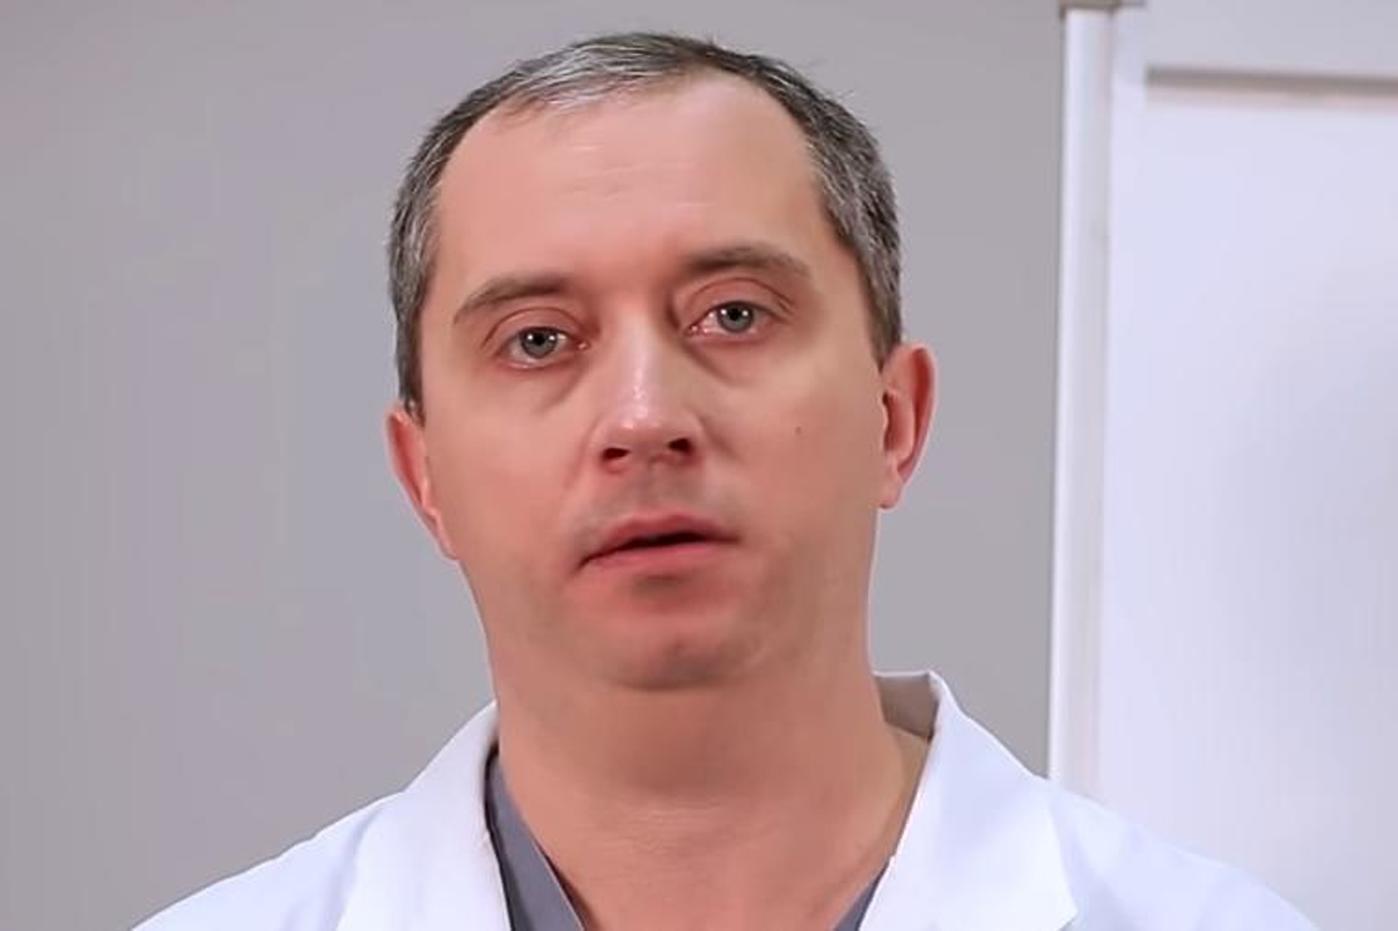 Hipertenzija MaxMedica